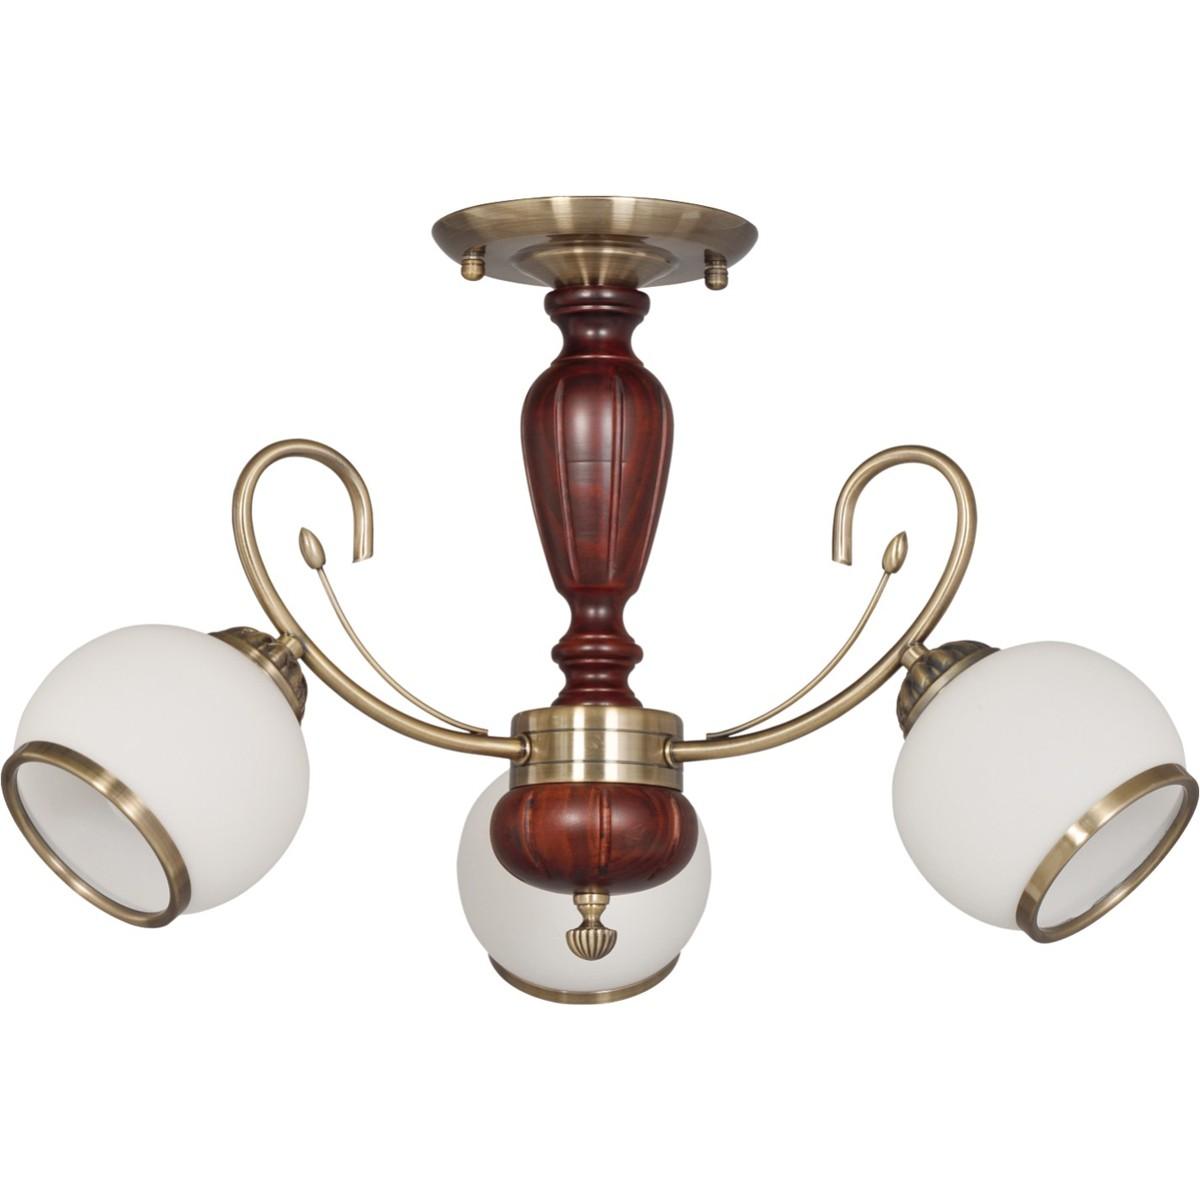 dedeman malawi 3 candelabru kl 7086 3x60w e27 lustre si candelabre corpuri de iluminat. Black Bedroom Furniture Sets. Home Design Ideas